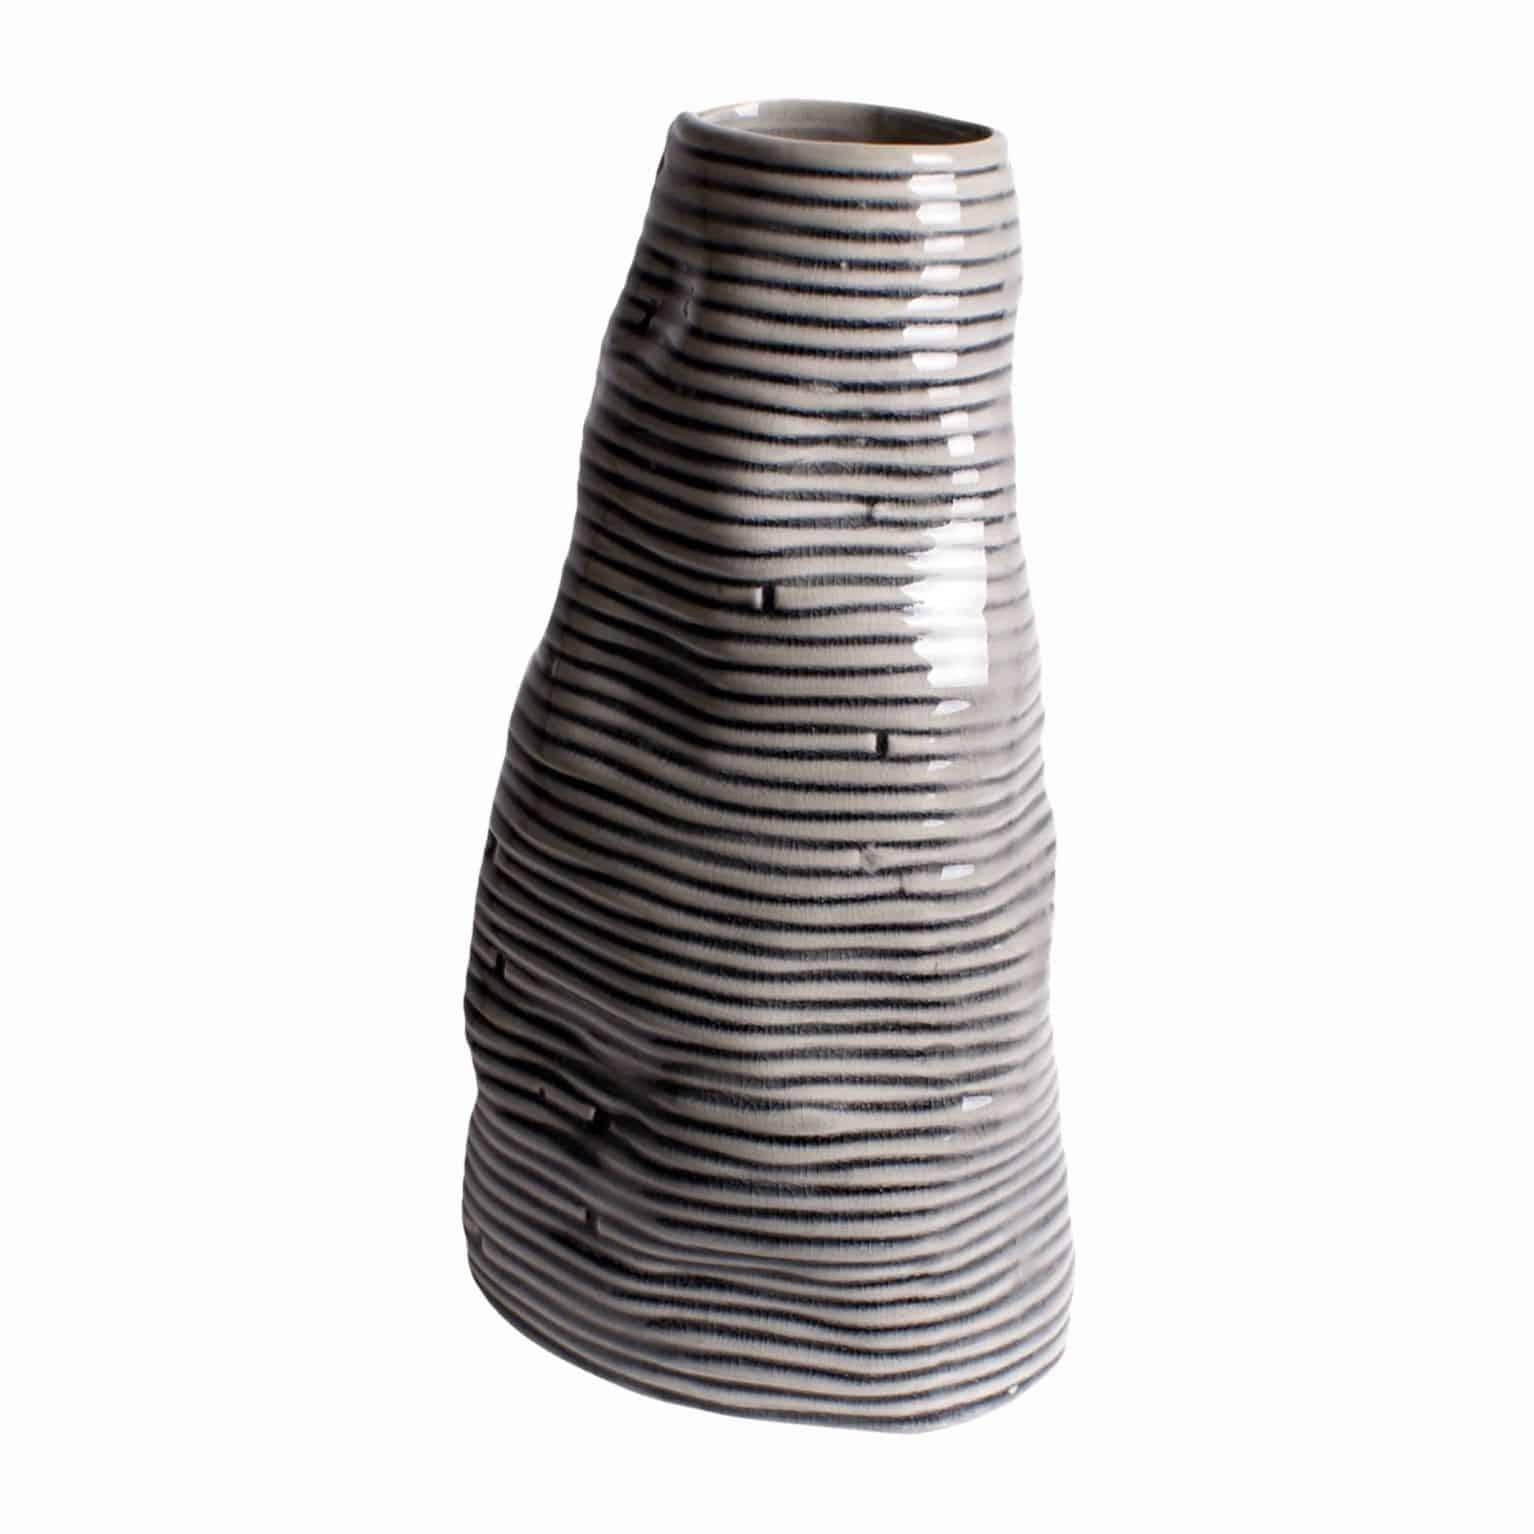 Shop for our distinctive handmade vase. A decorative tall